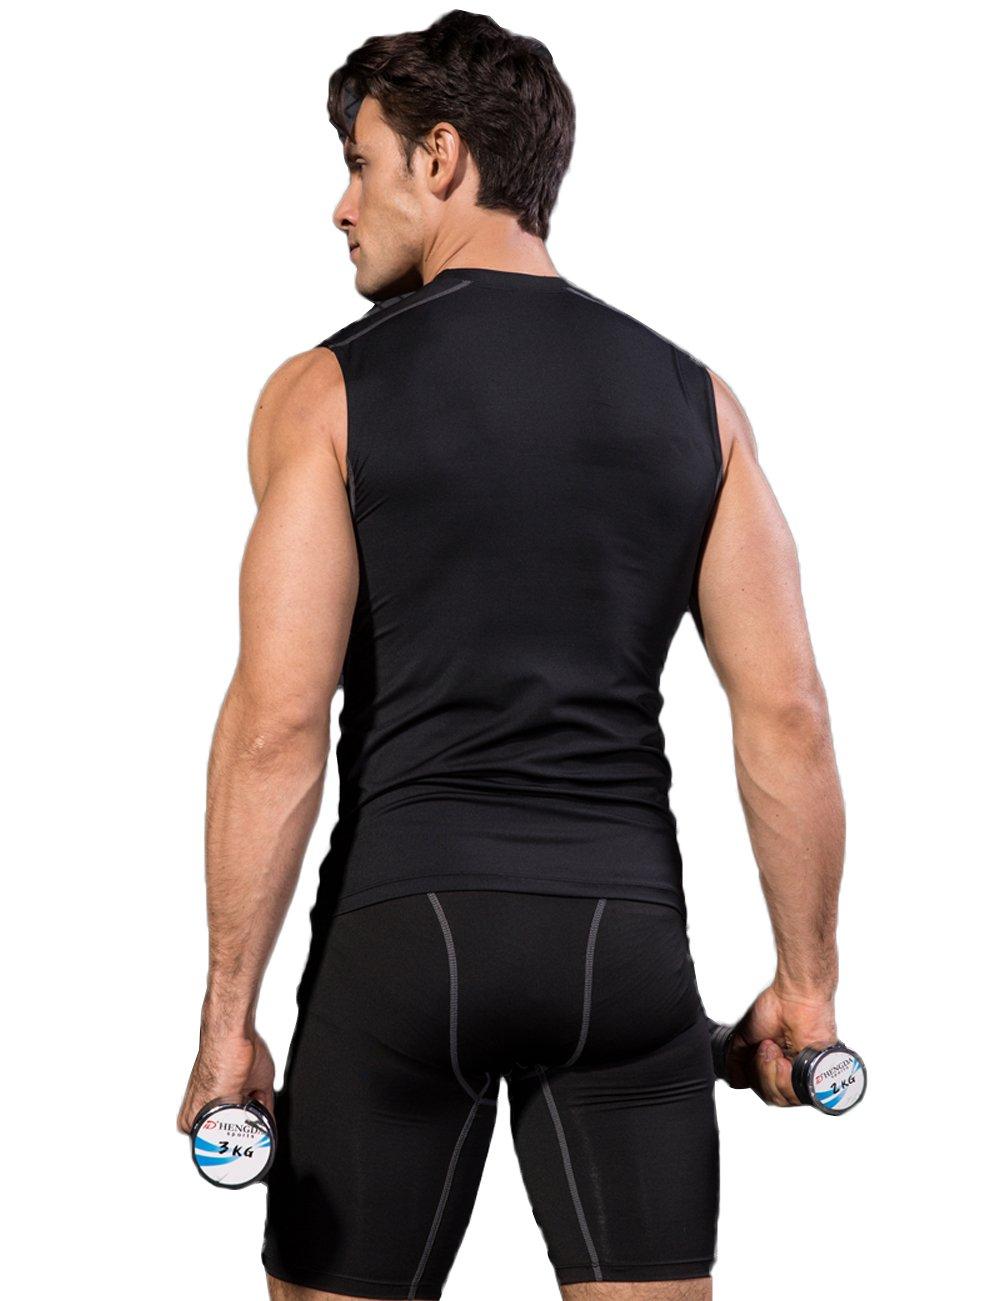 Lavento Mens Tank Top Running Moisture Wicking Cool Dry Sleeveless T-Shirts